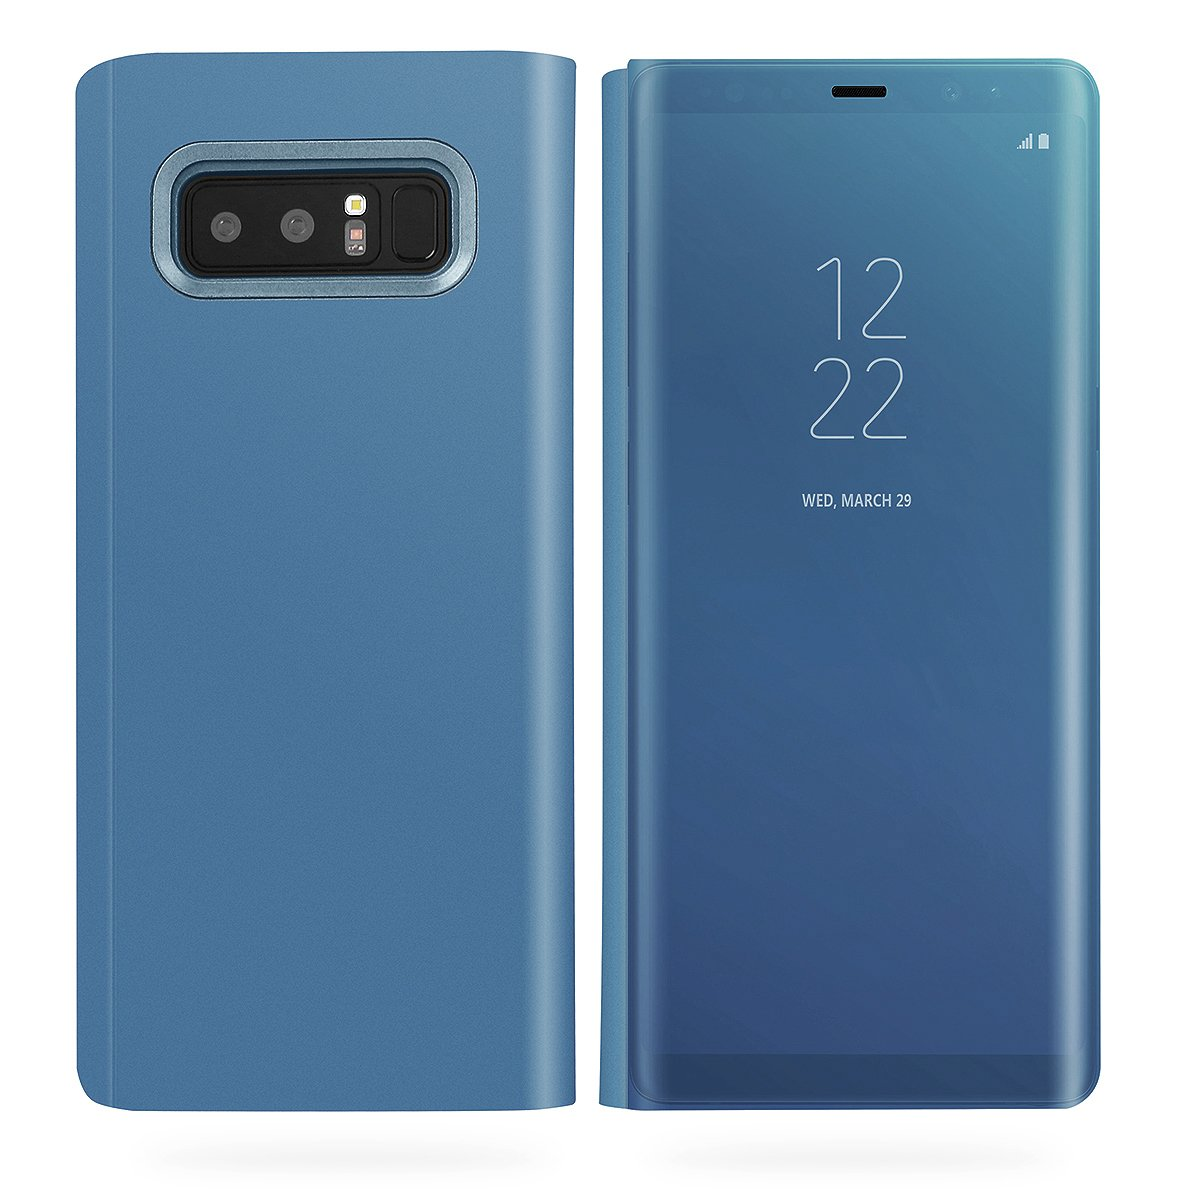 High Capacity Long Life 3500mAh Excellent Business Battery for Samsung Galaxy J7 Refine 2018 SM-J737P Phone